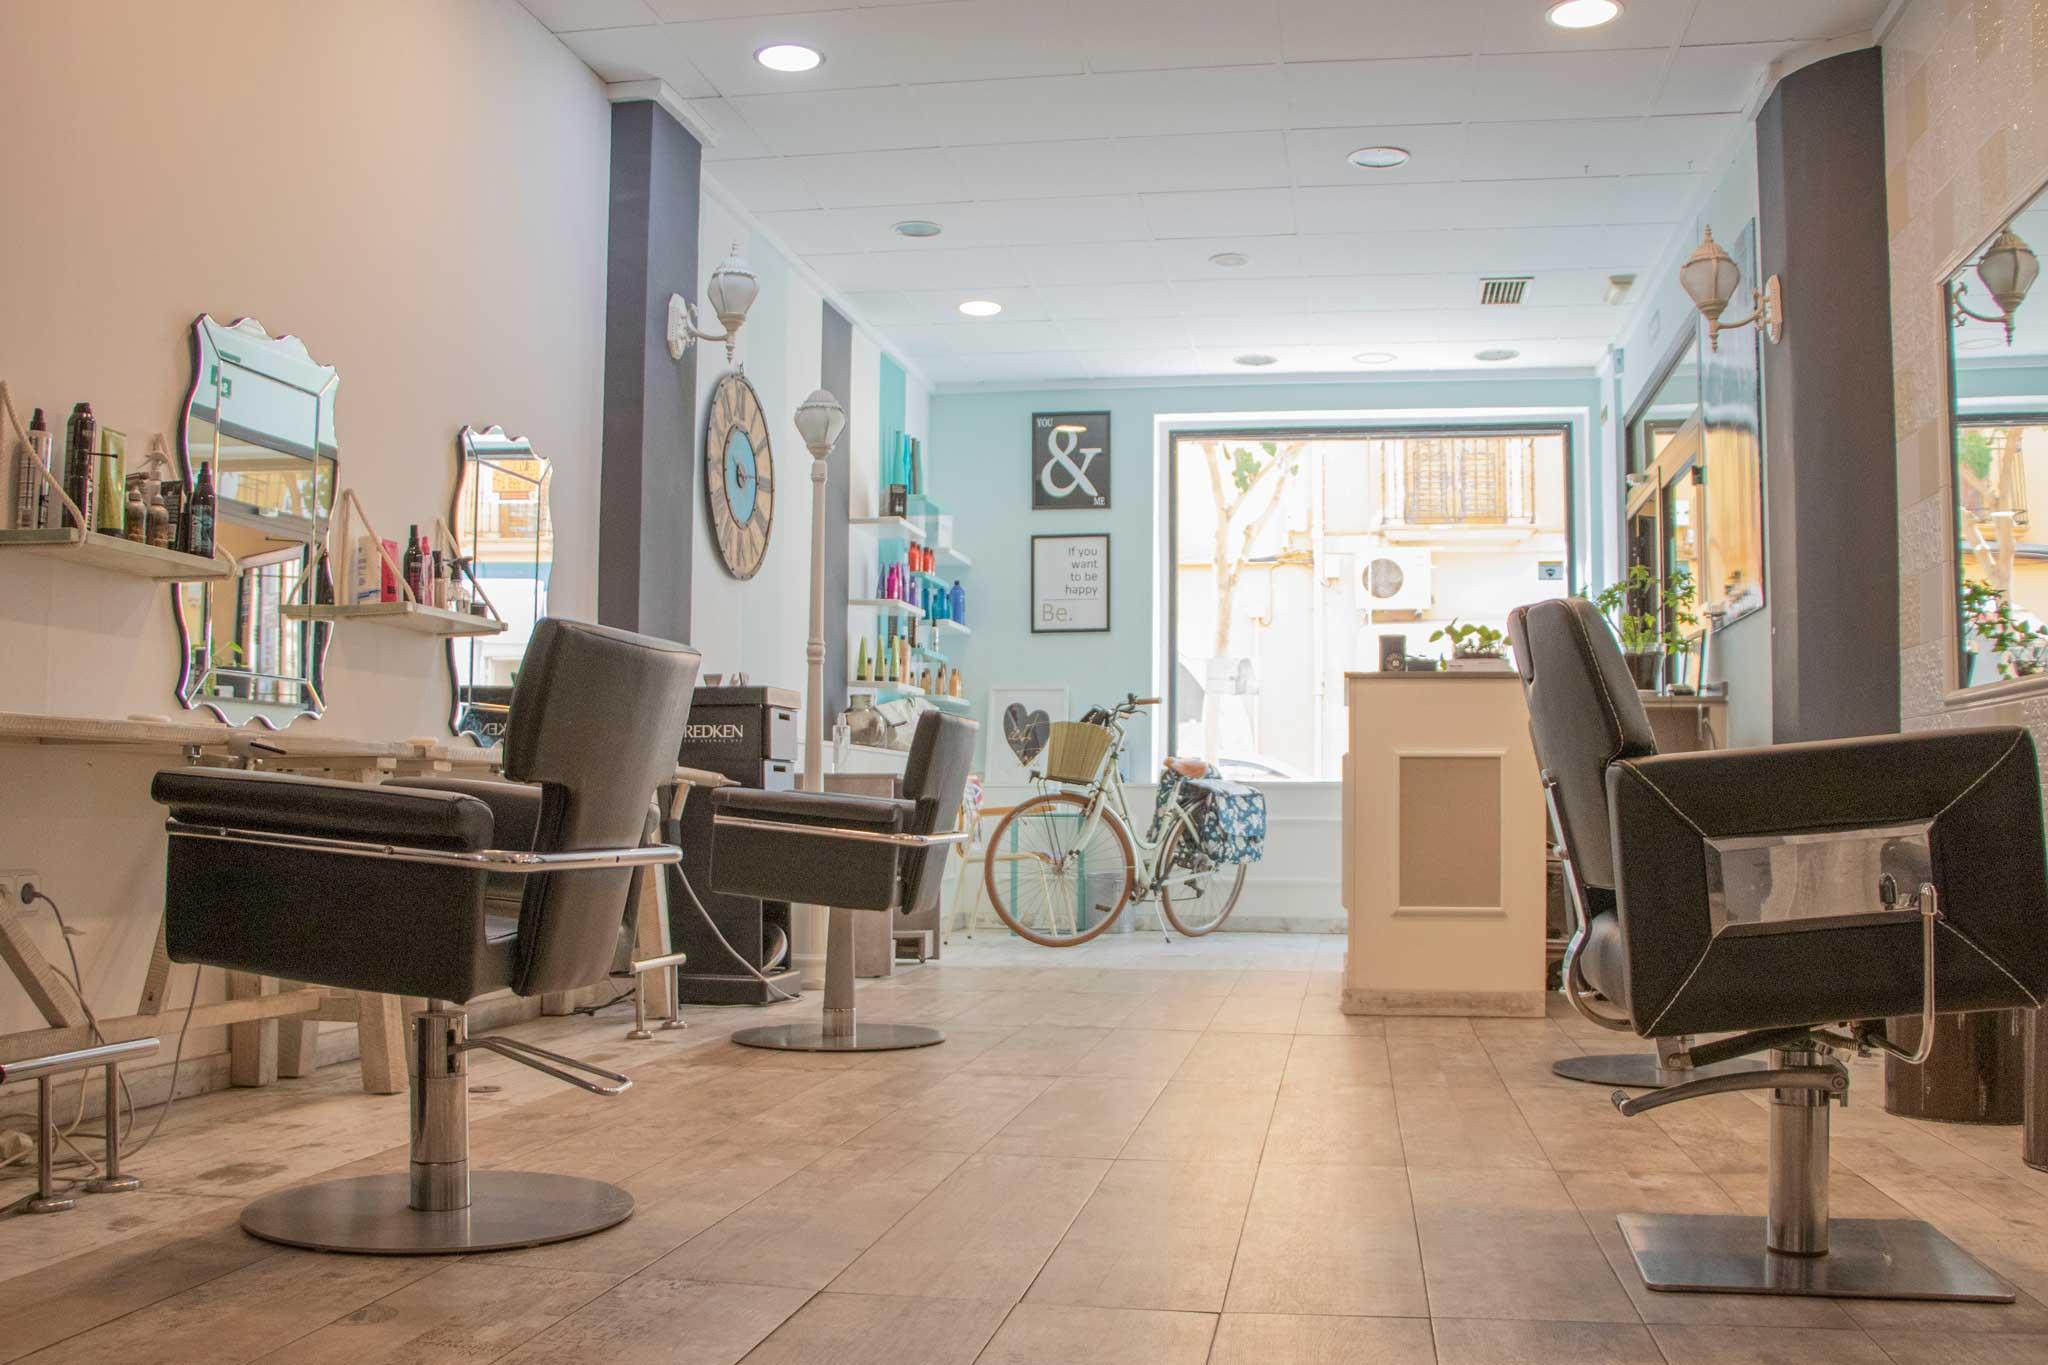 Salon de peluqueria Denia – Peluquería La Mode